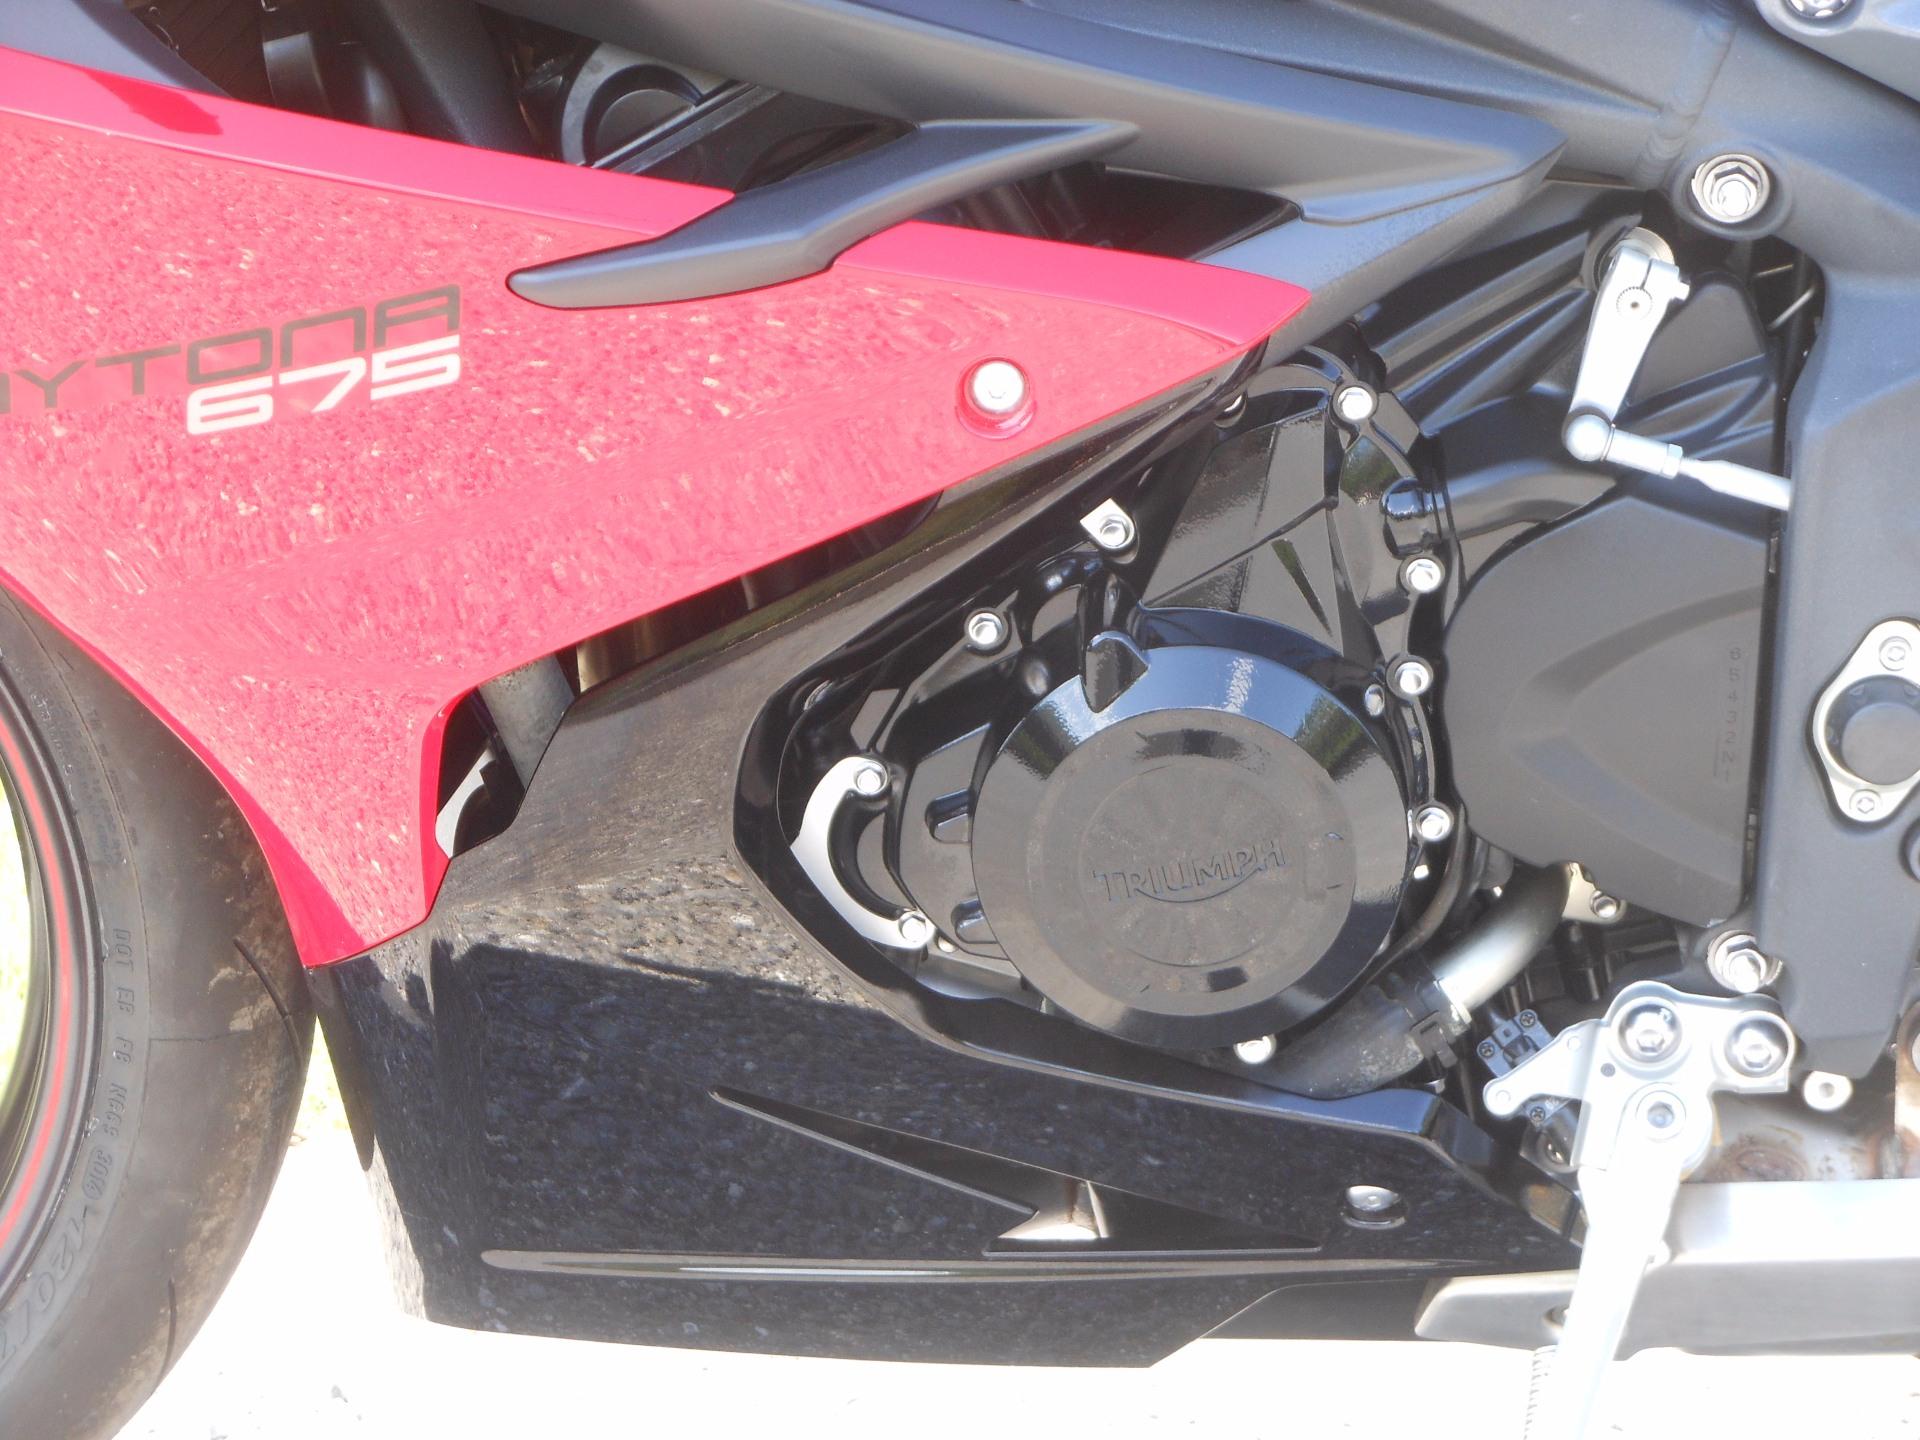 2015 Triumph Daytona 675 ABS in Port Clinton, Pennsylvania